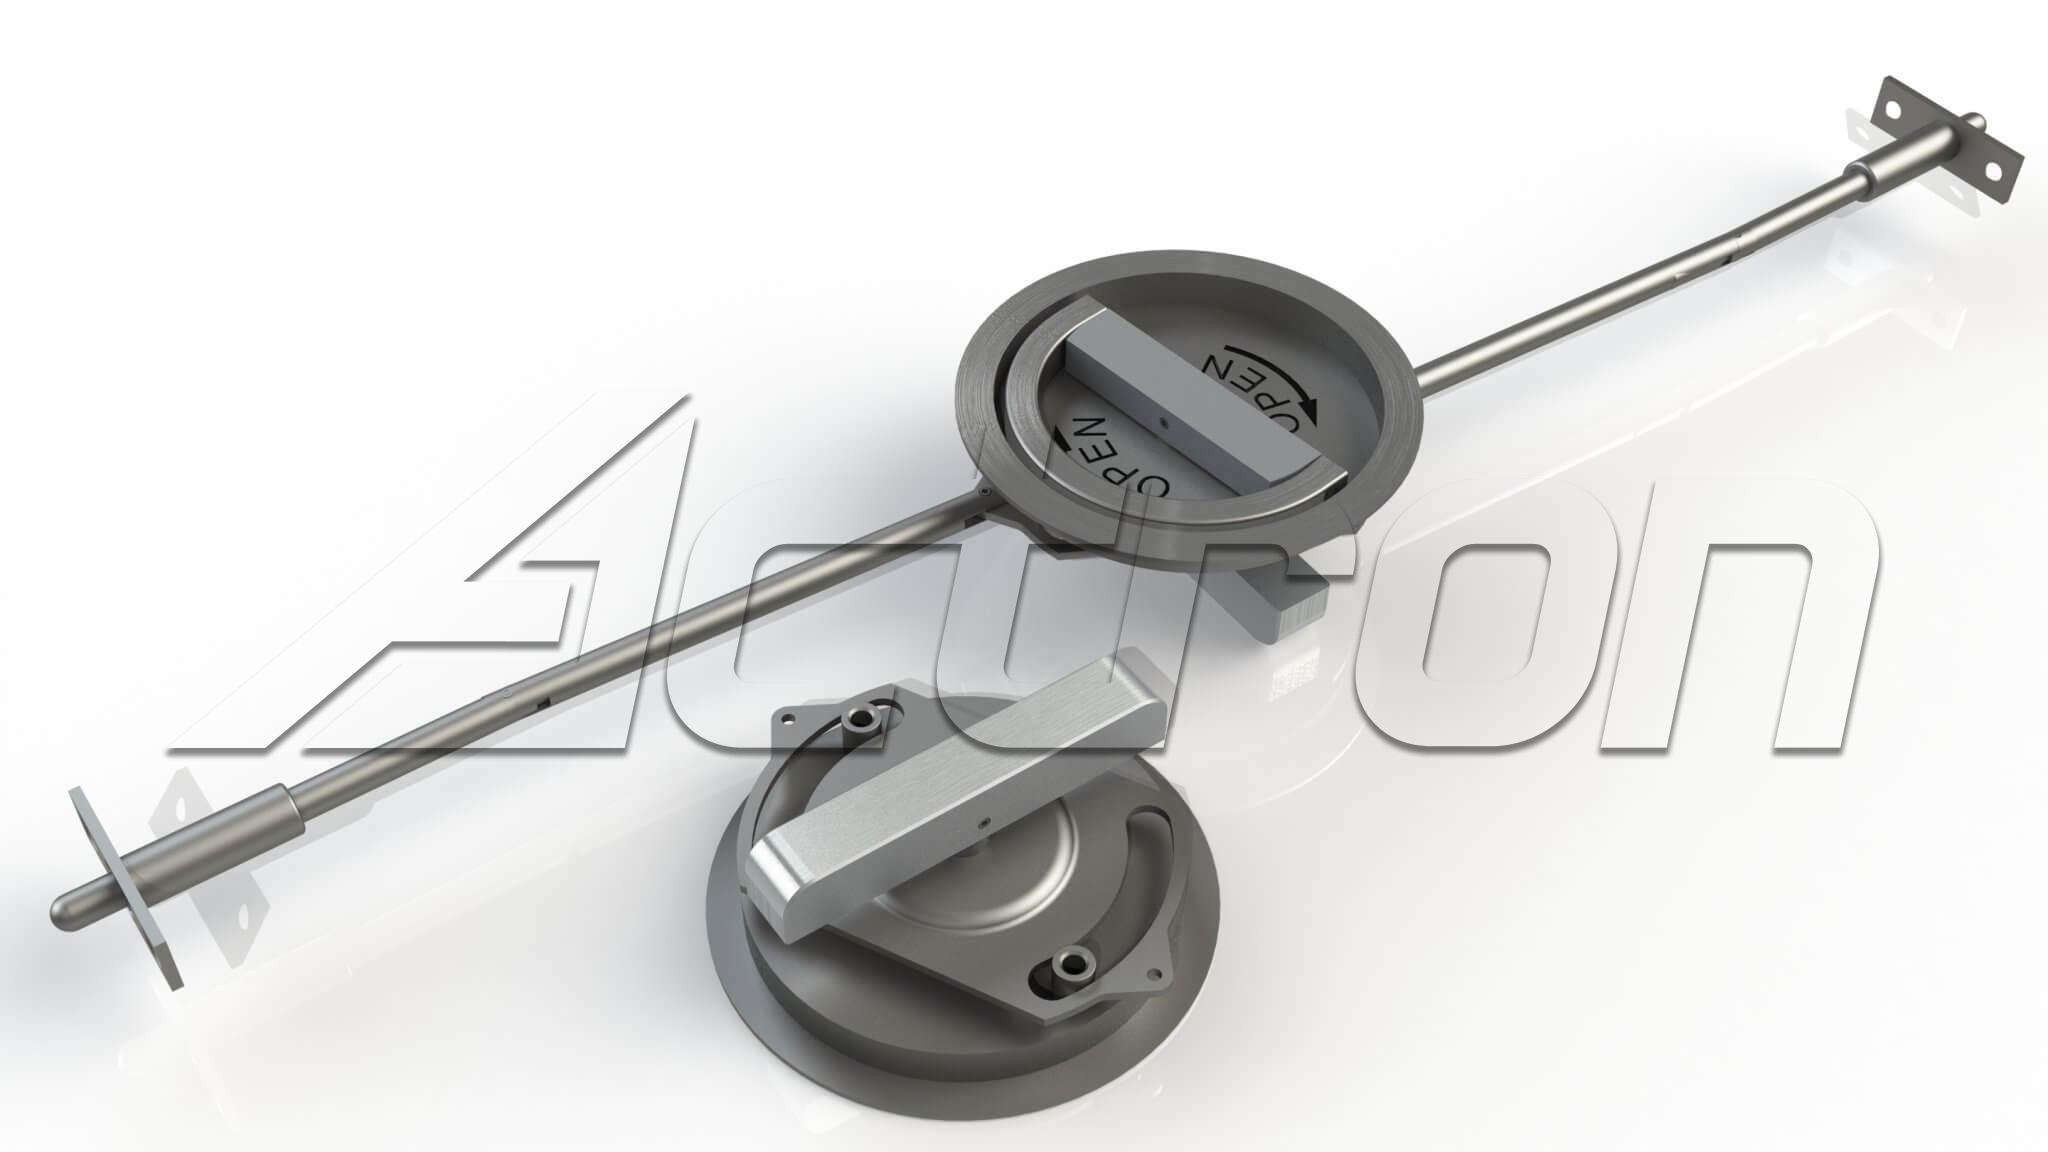 door-bolting-system-8211-d-handle-4480-a39102.jpg